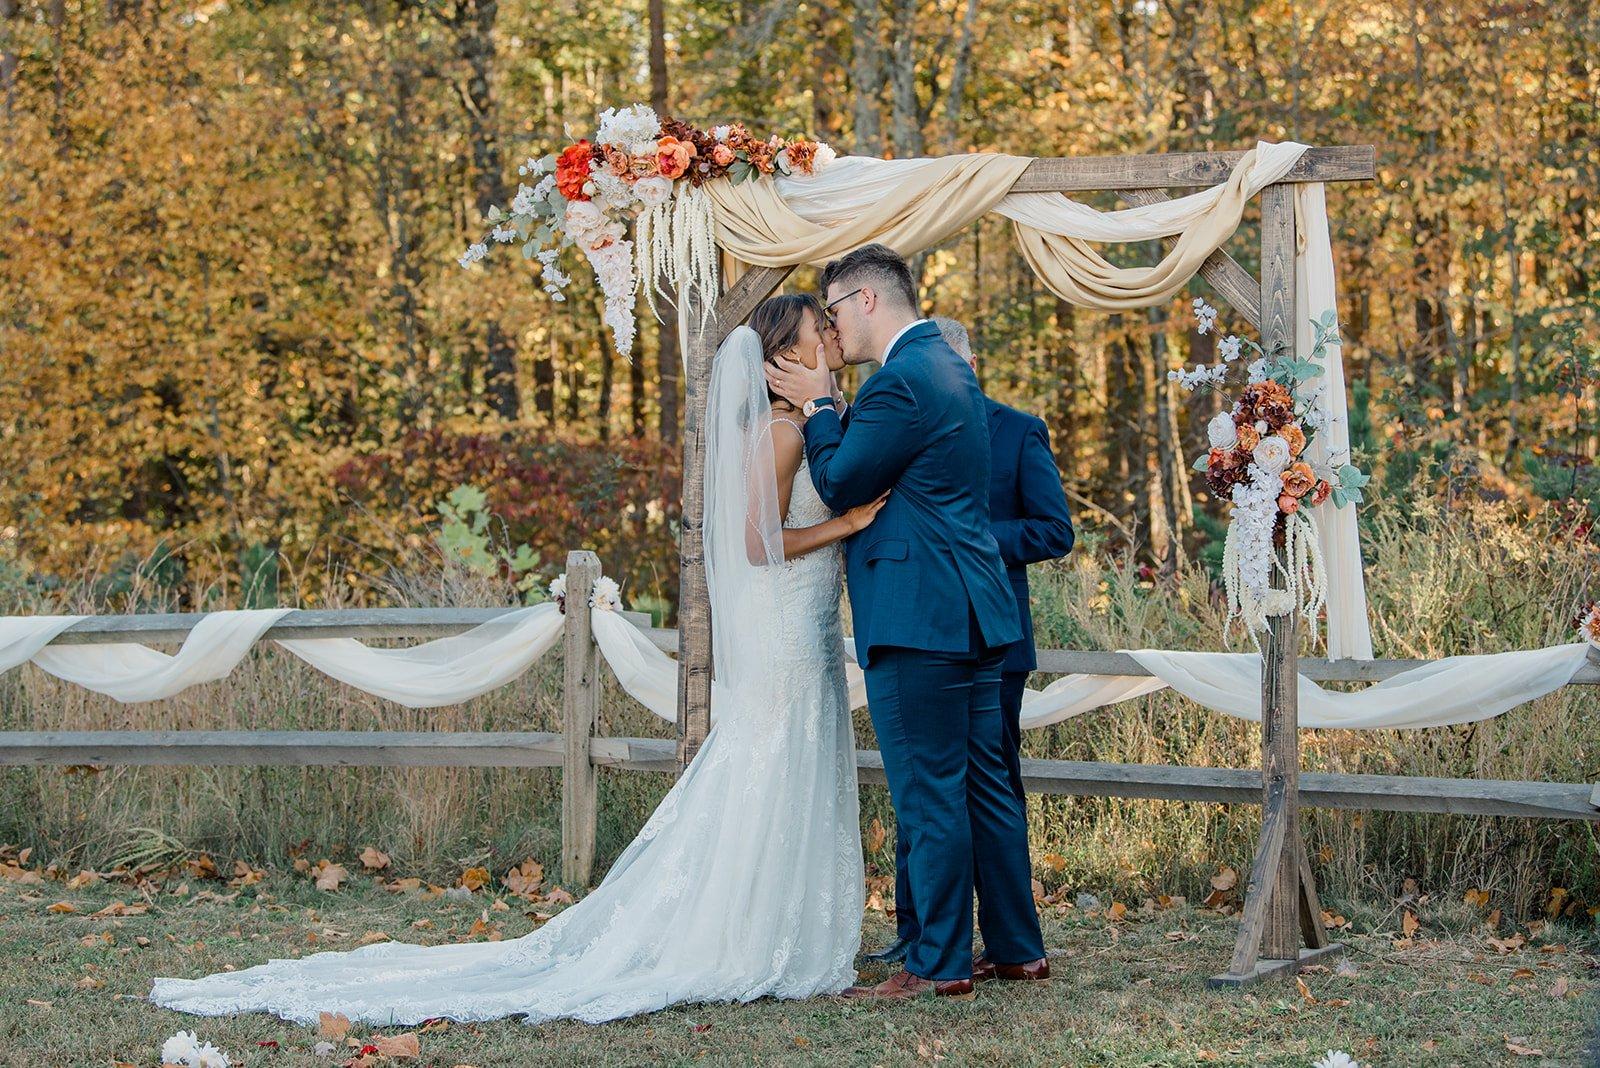 Kalika and I kissing as we become married